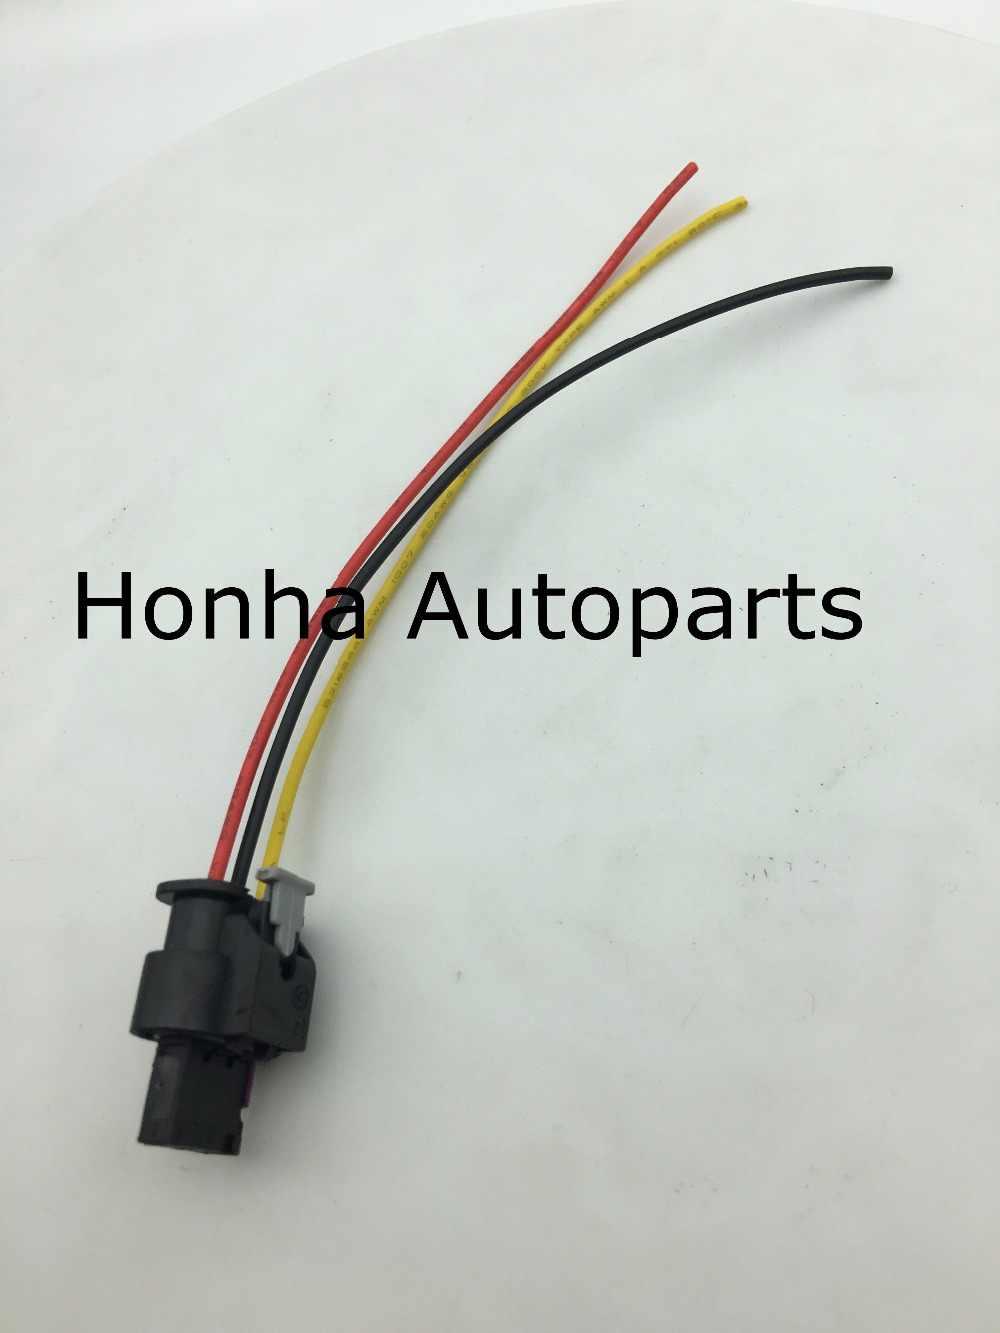 3 flat wiring harness wiring diagram paper 3 flat wiring harness diagram 3 flat wiring harness [ 1000 x 1333 Pixel ]